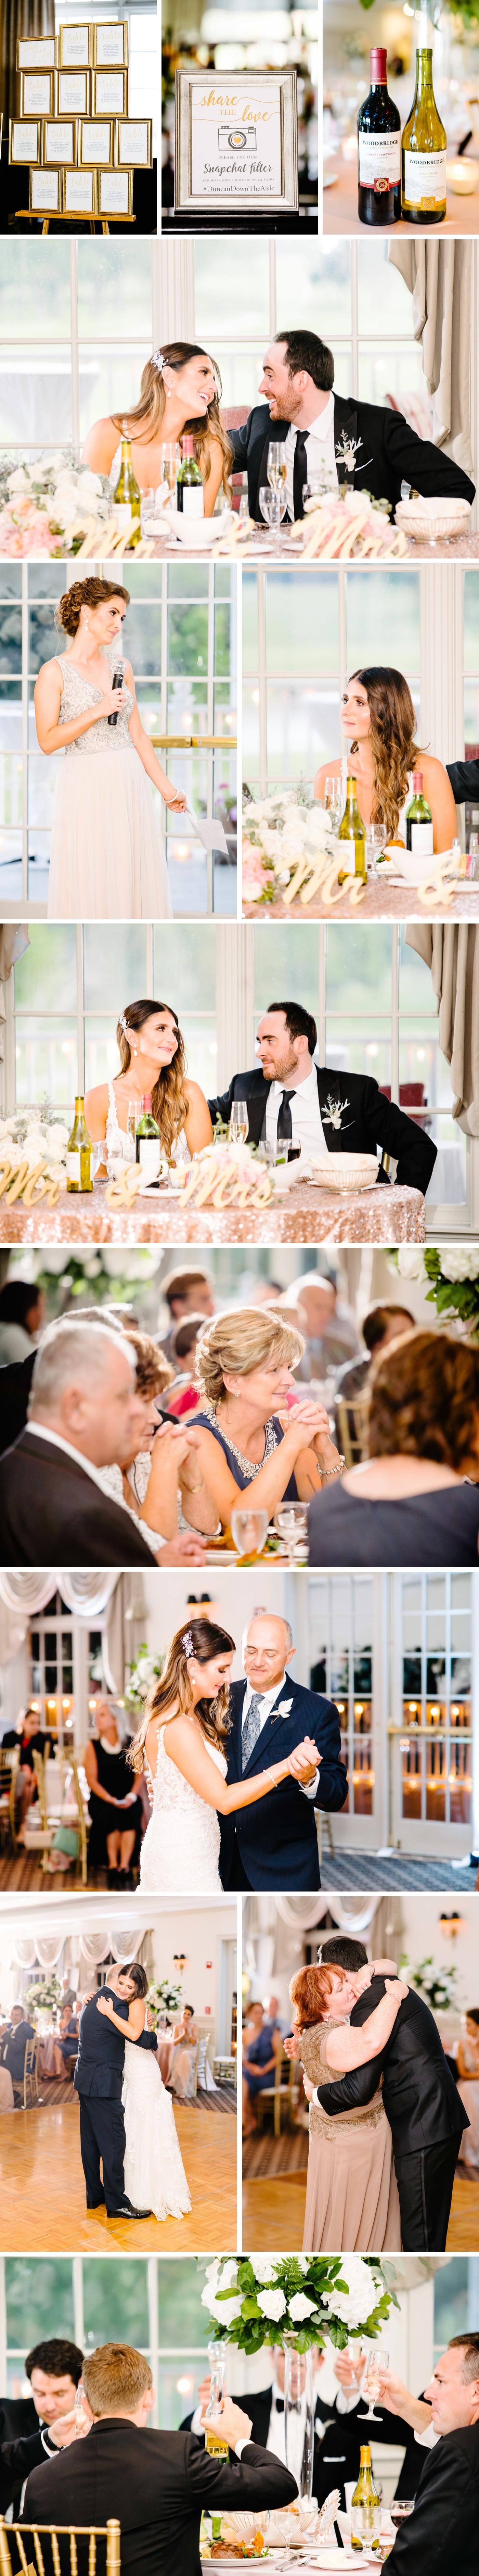 chicago-fine-art-wedding-photography-duncan78